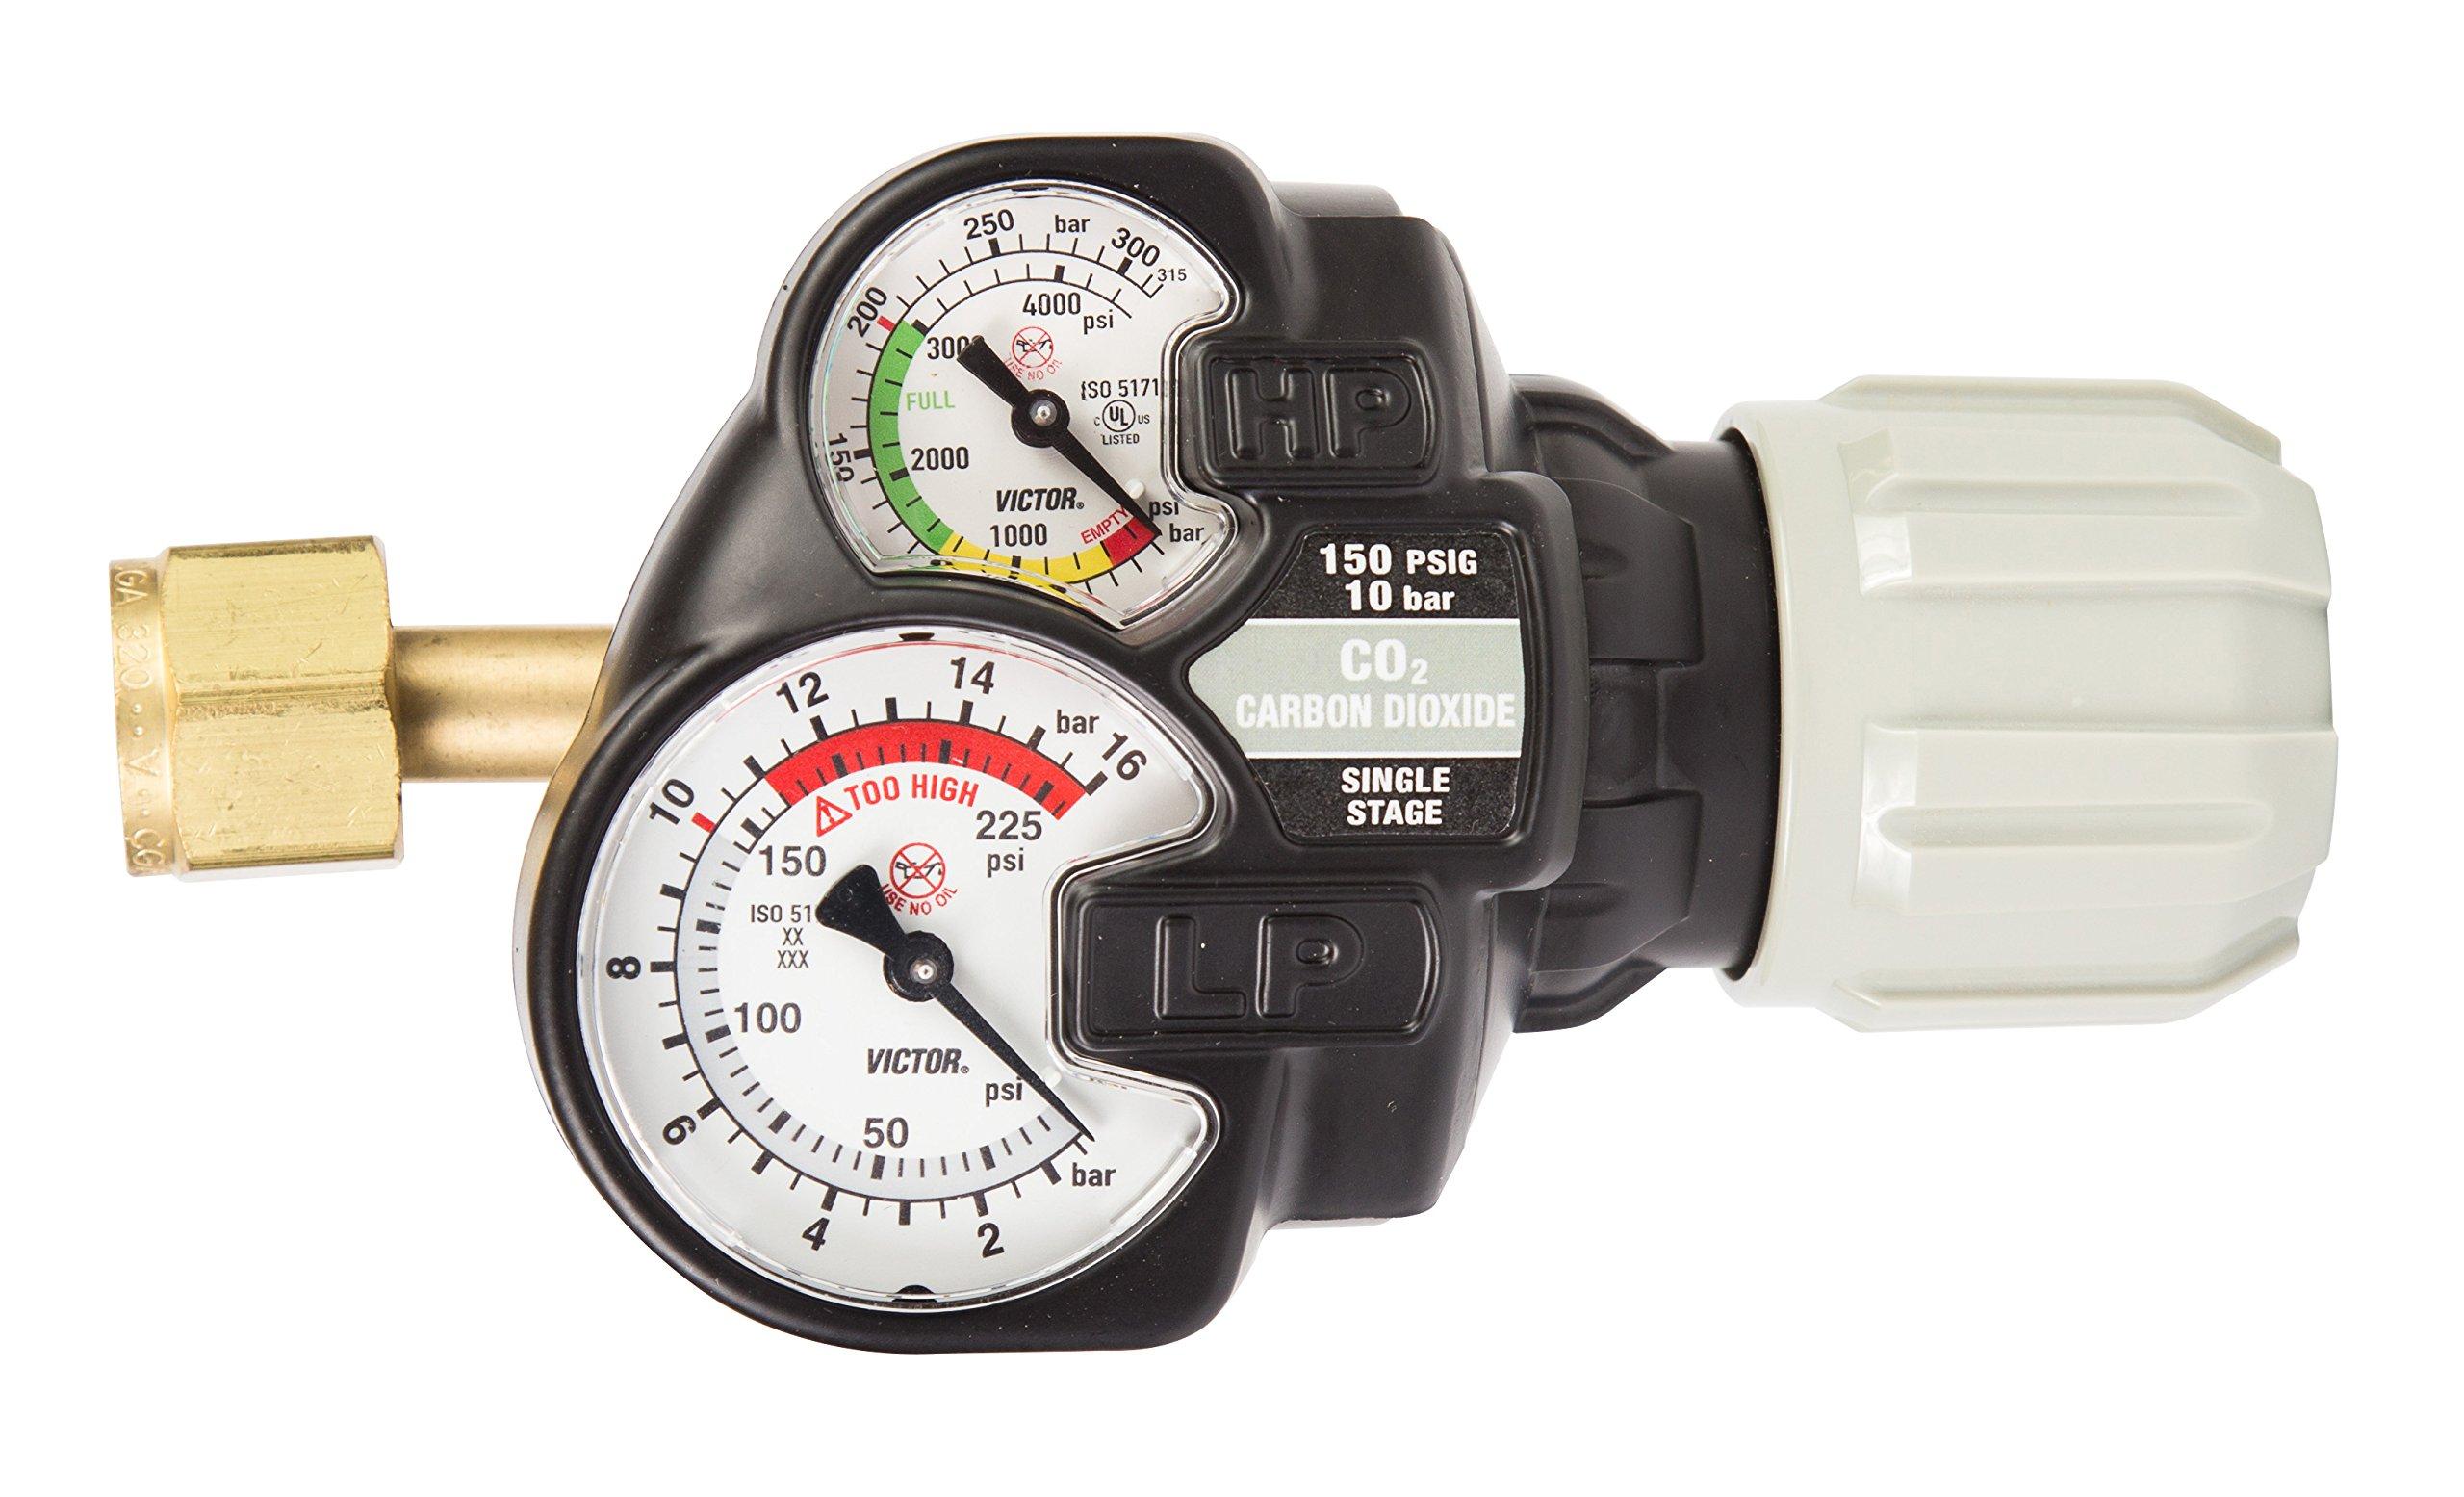 Victor 0781-3615 Series Edge 2.0 ESS42-150-320 Regulator, Carbon Dioxide